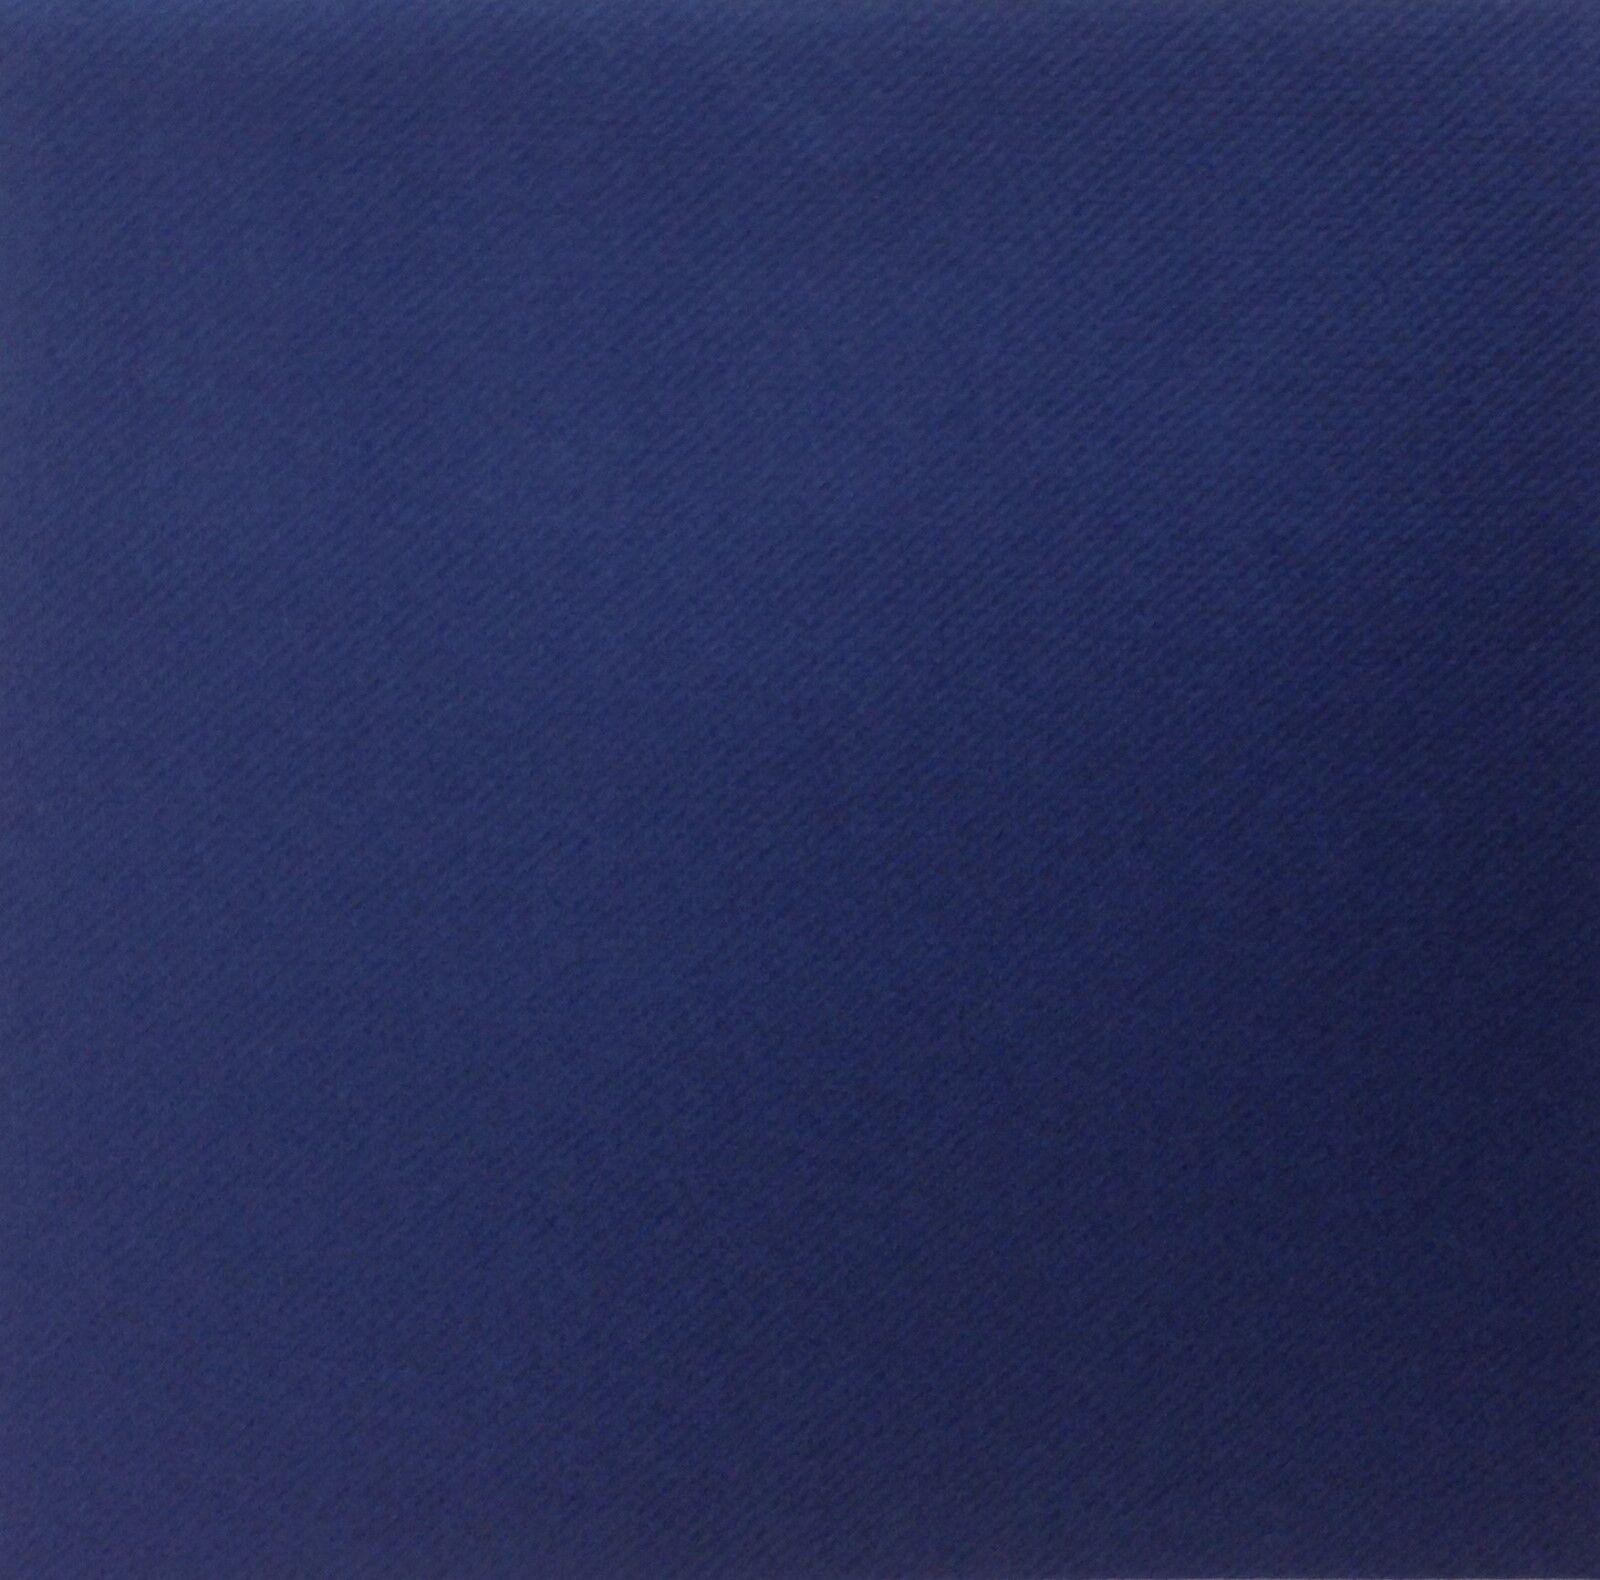 500 x bleu marine tablin Toison Papier Premium serviettes 40 cm Lin Feel Serviettes